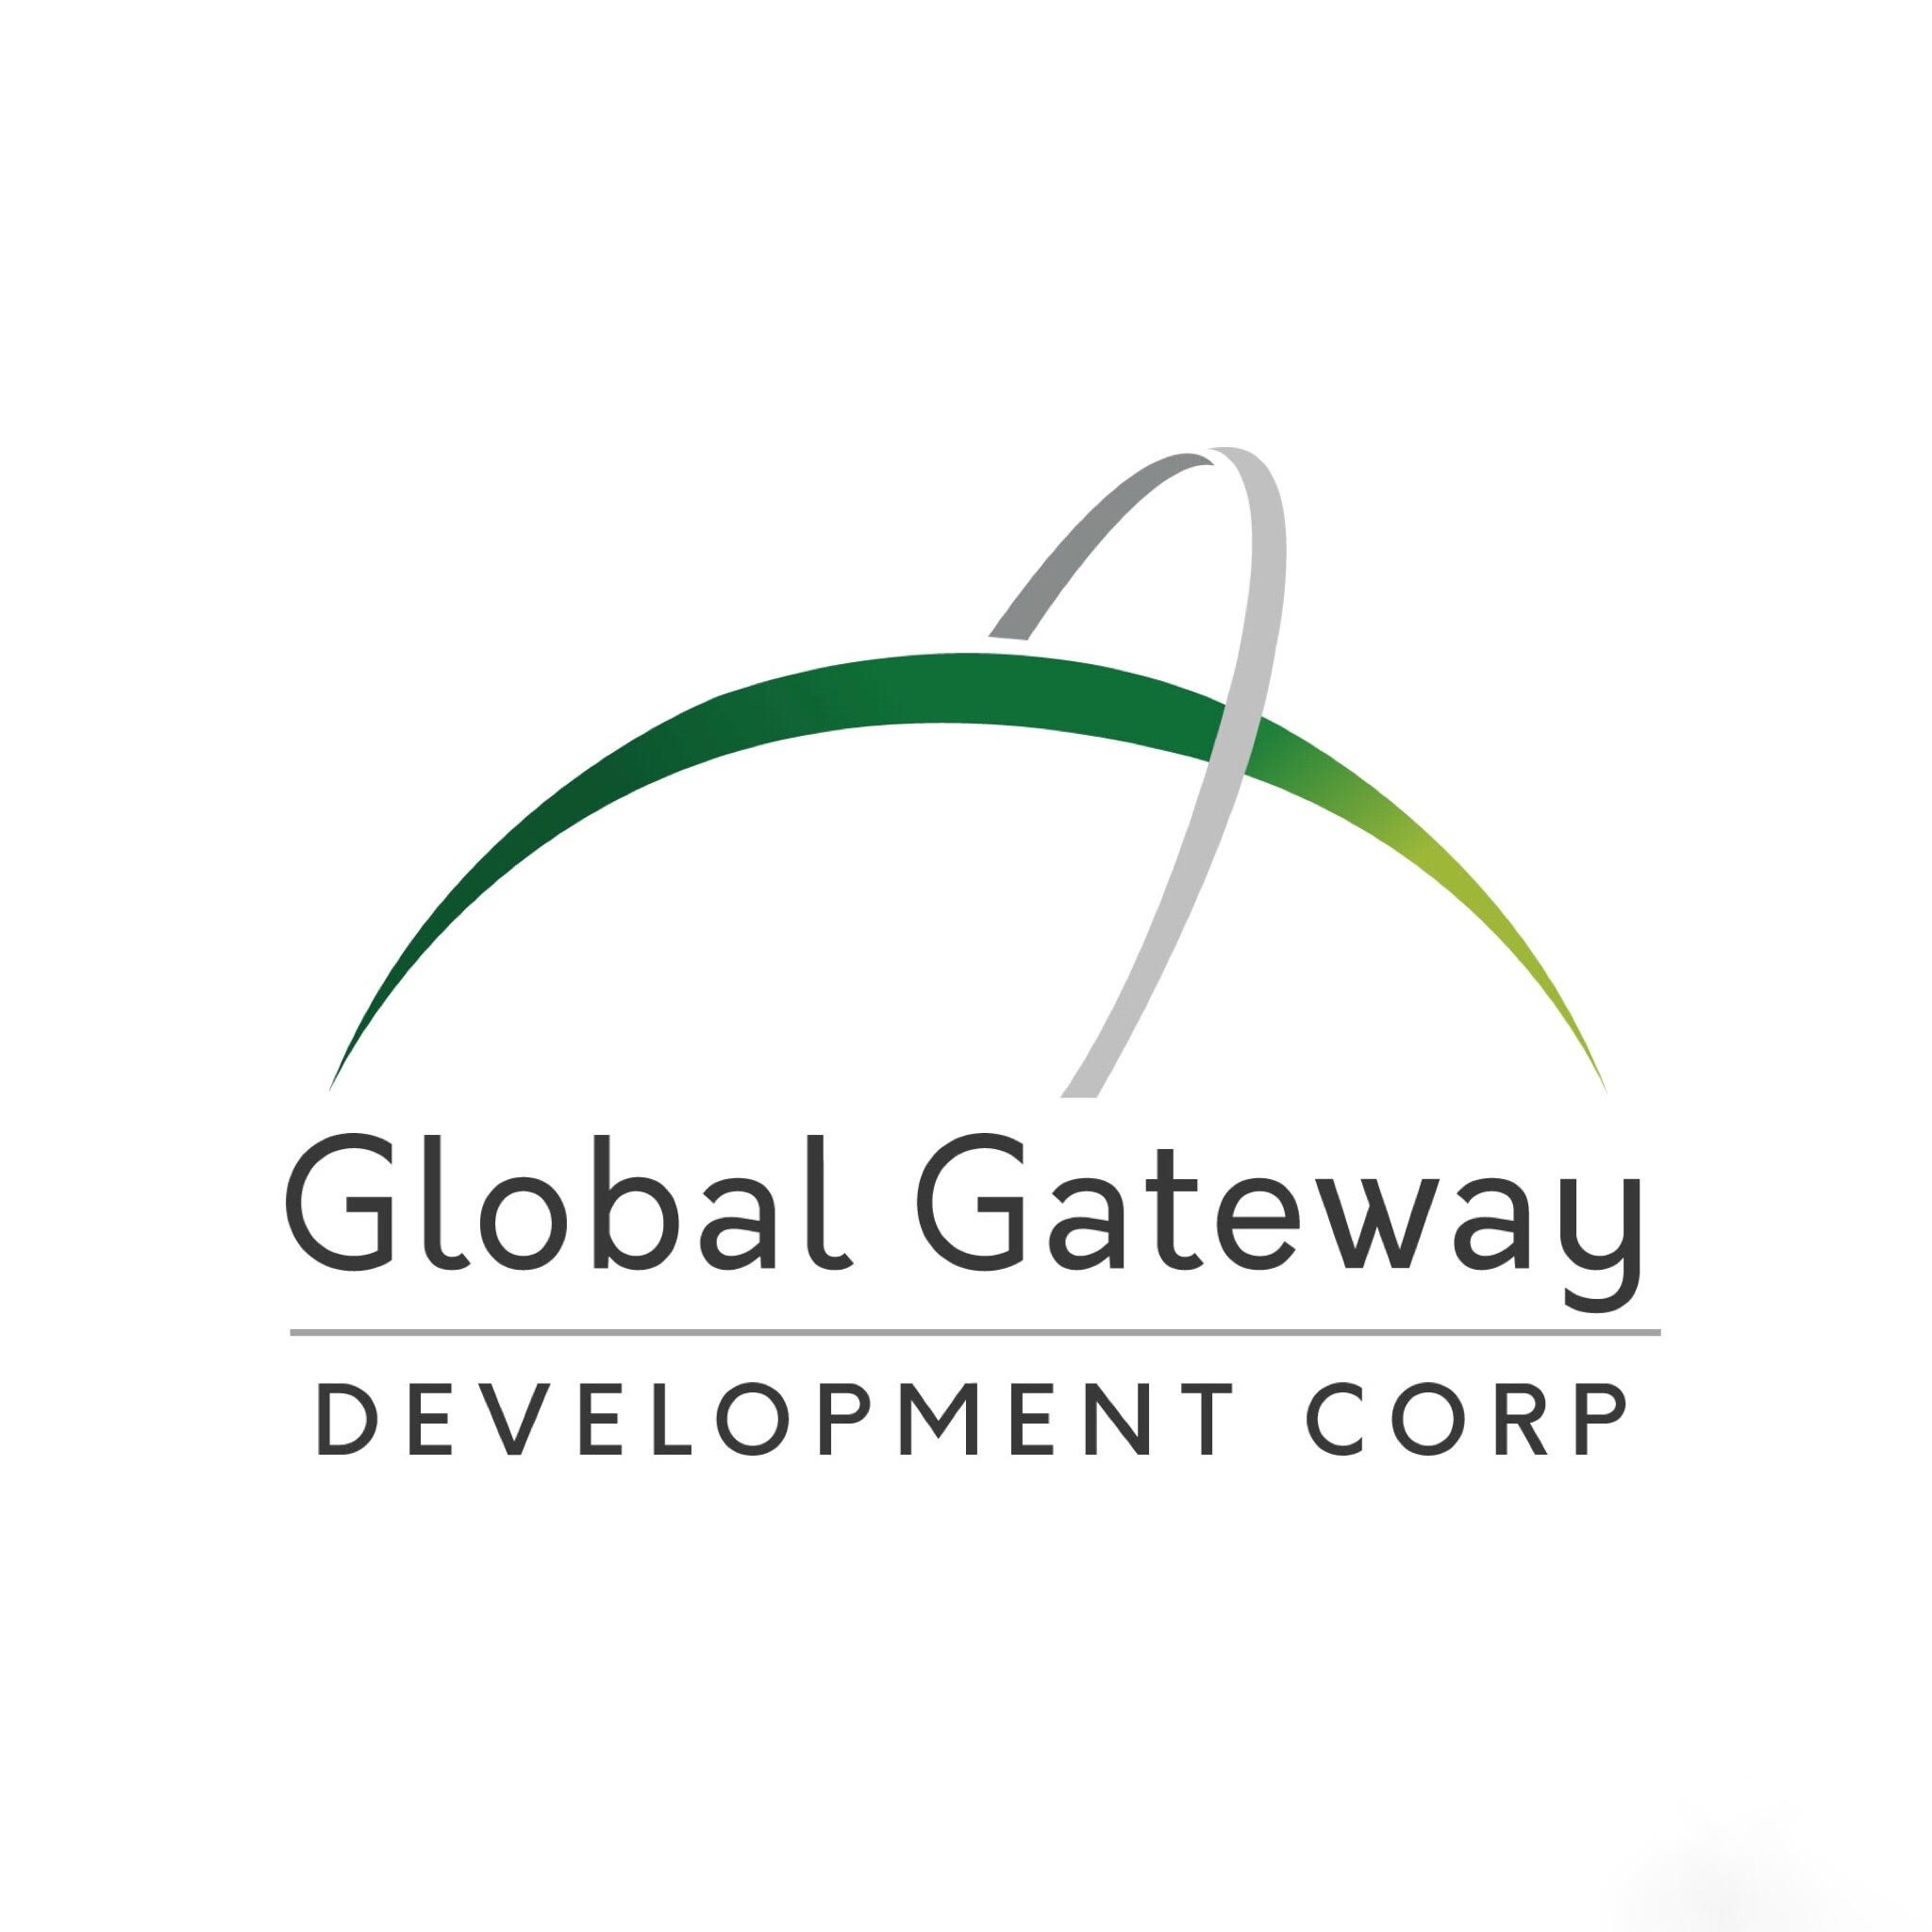 Global Gateway Development Corporation